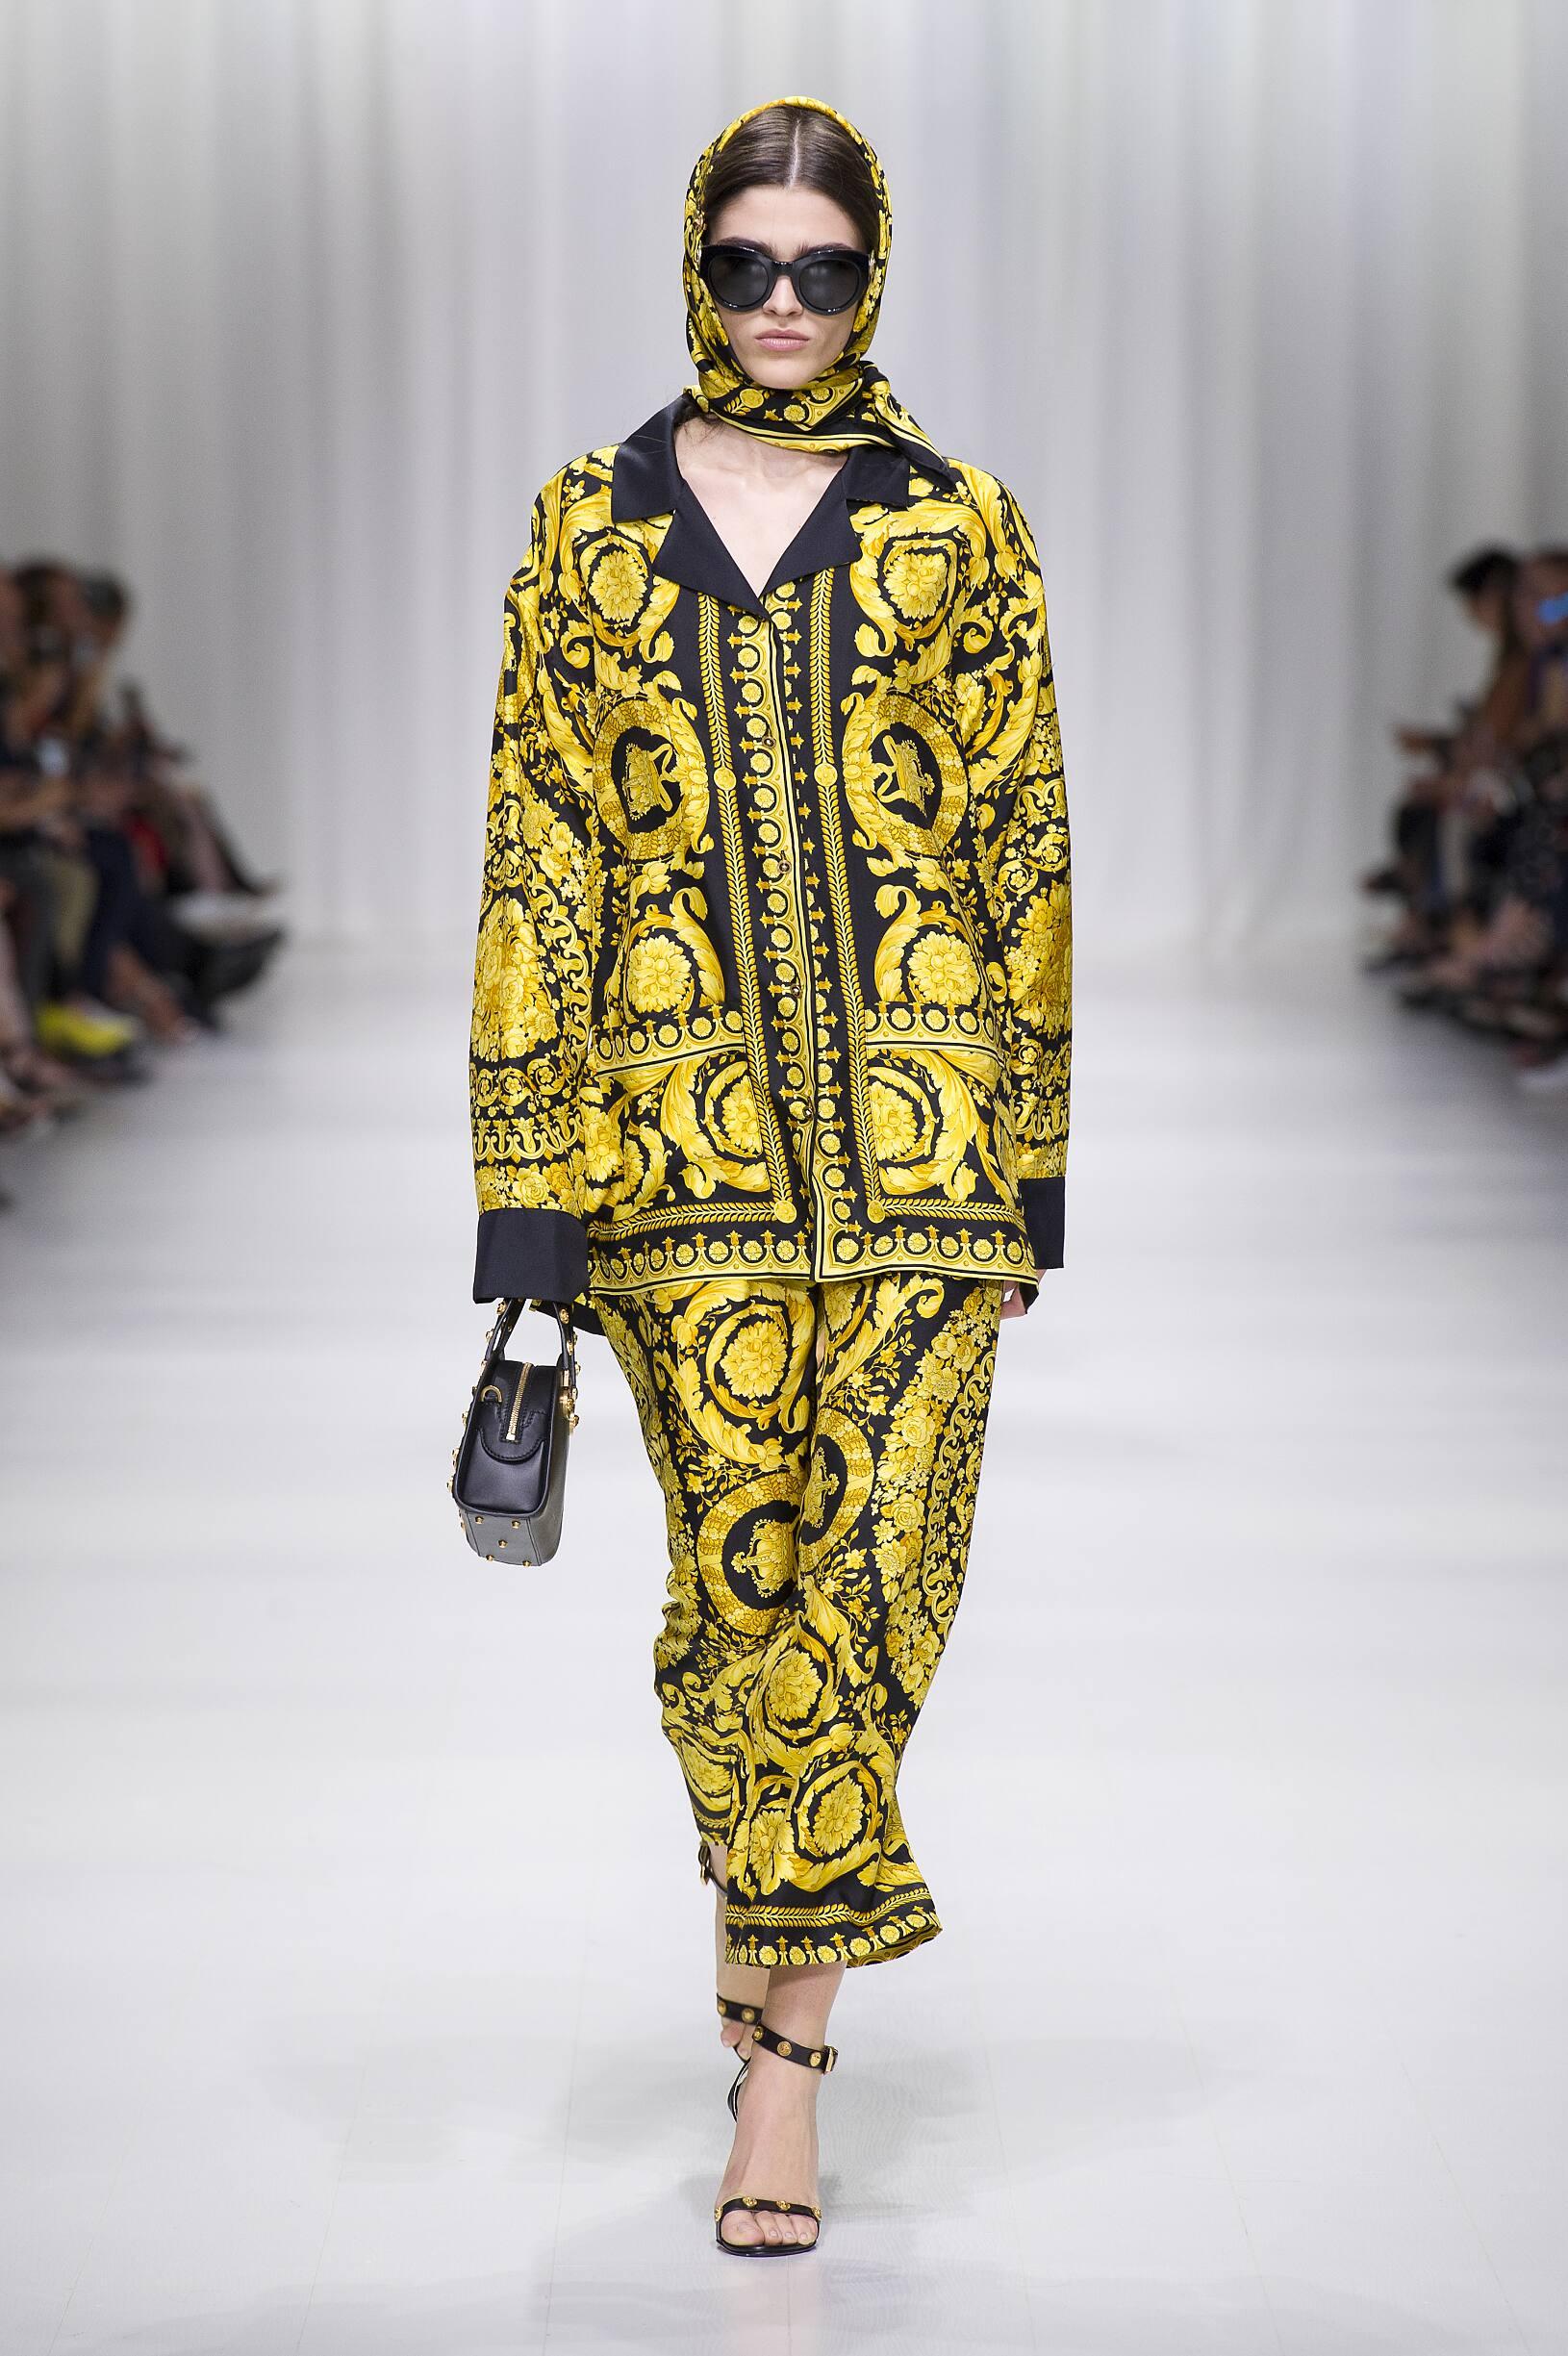 Model Fashion Show Versace